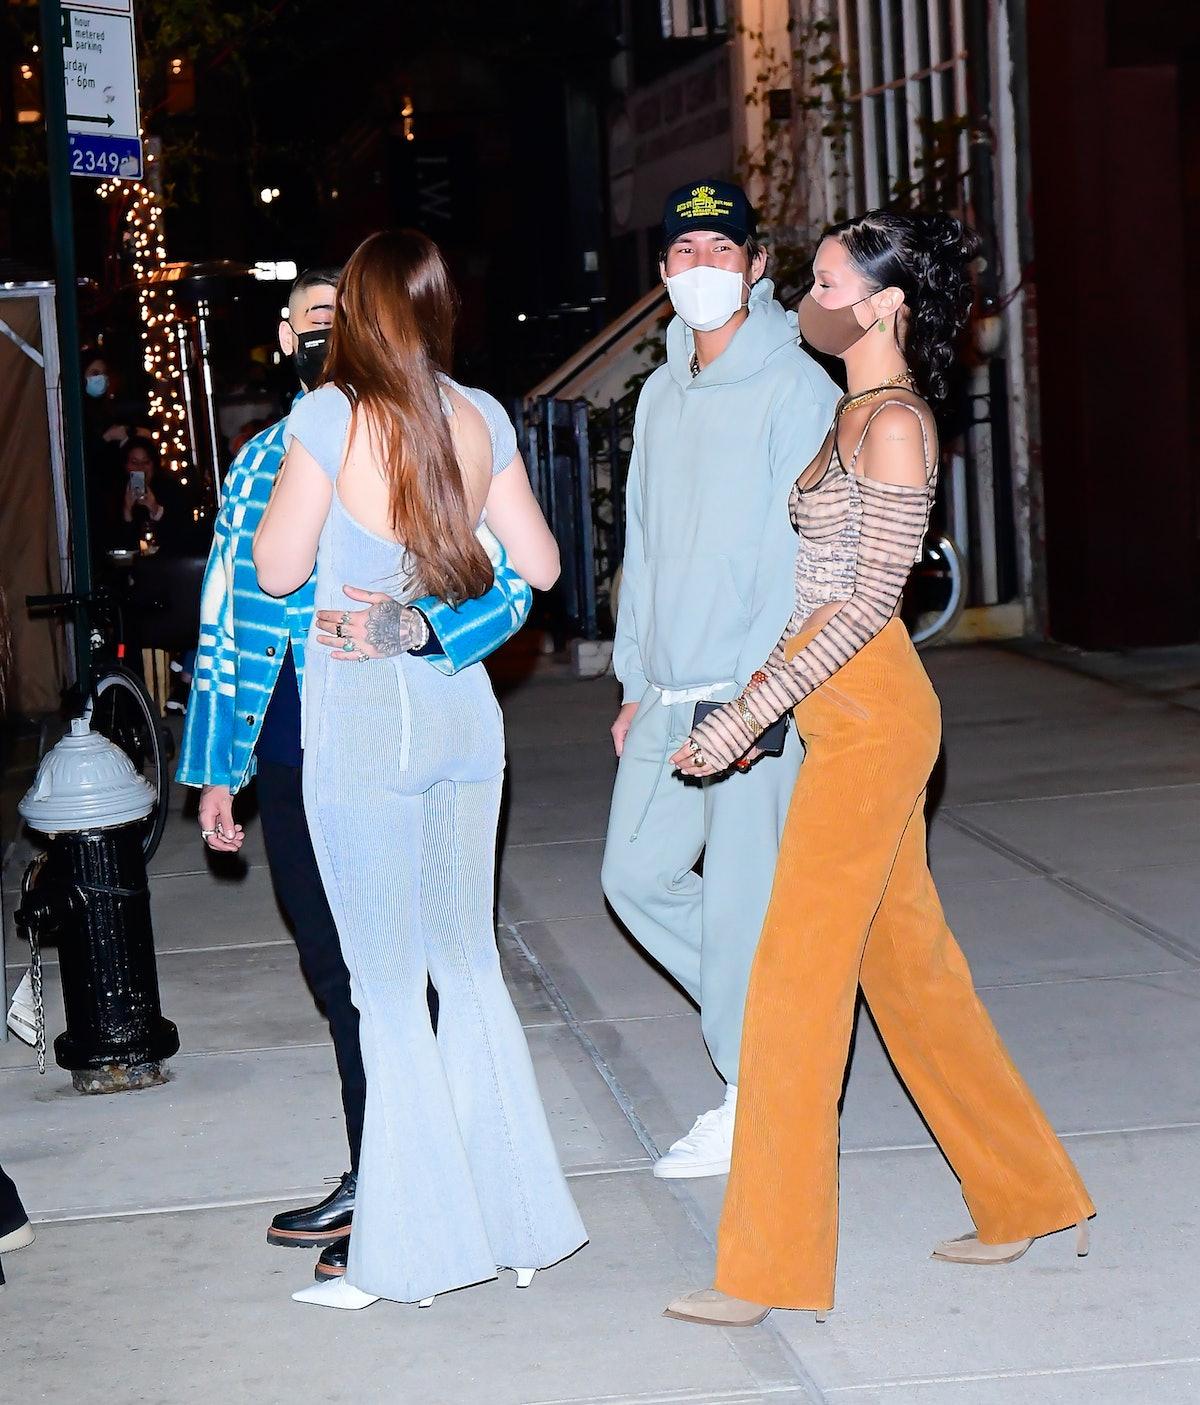 NEW YORK, NY - APRIL 23:  Zayn Malik, Gigi Hadid and Bella Hadid are seen on April 23, 2021 in New York City.  (Photo by Raymond Hall/GC Images)